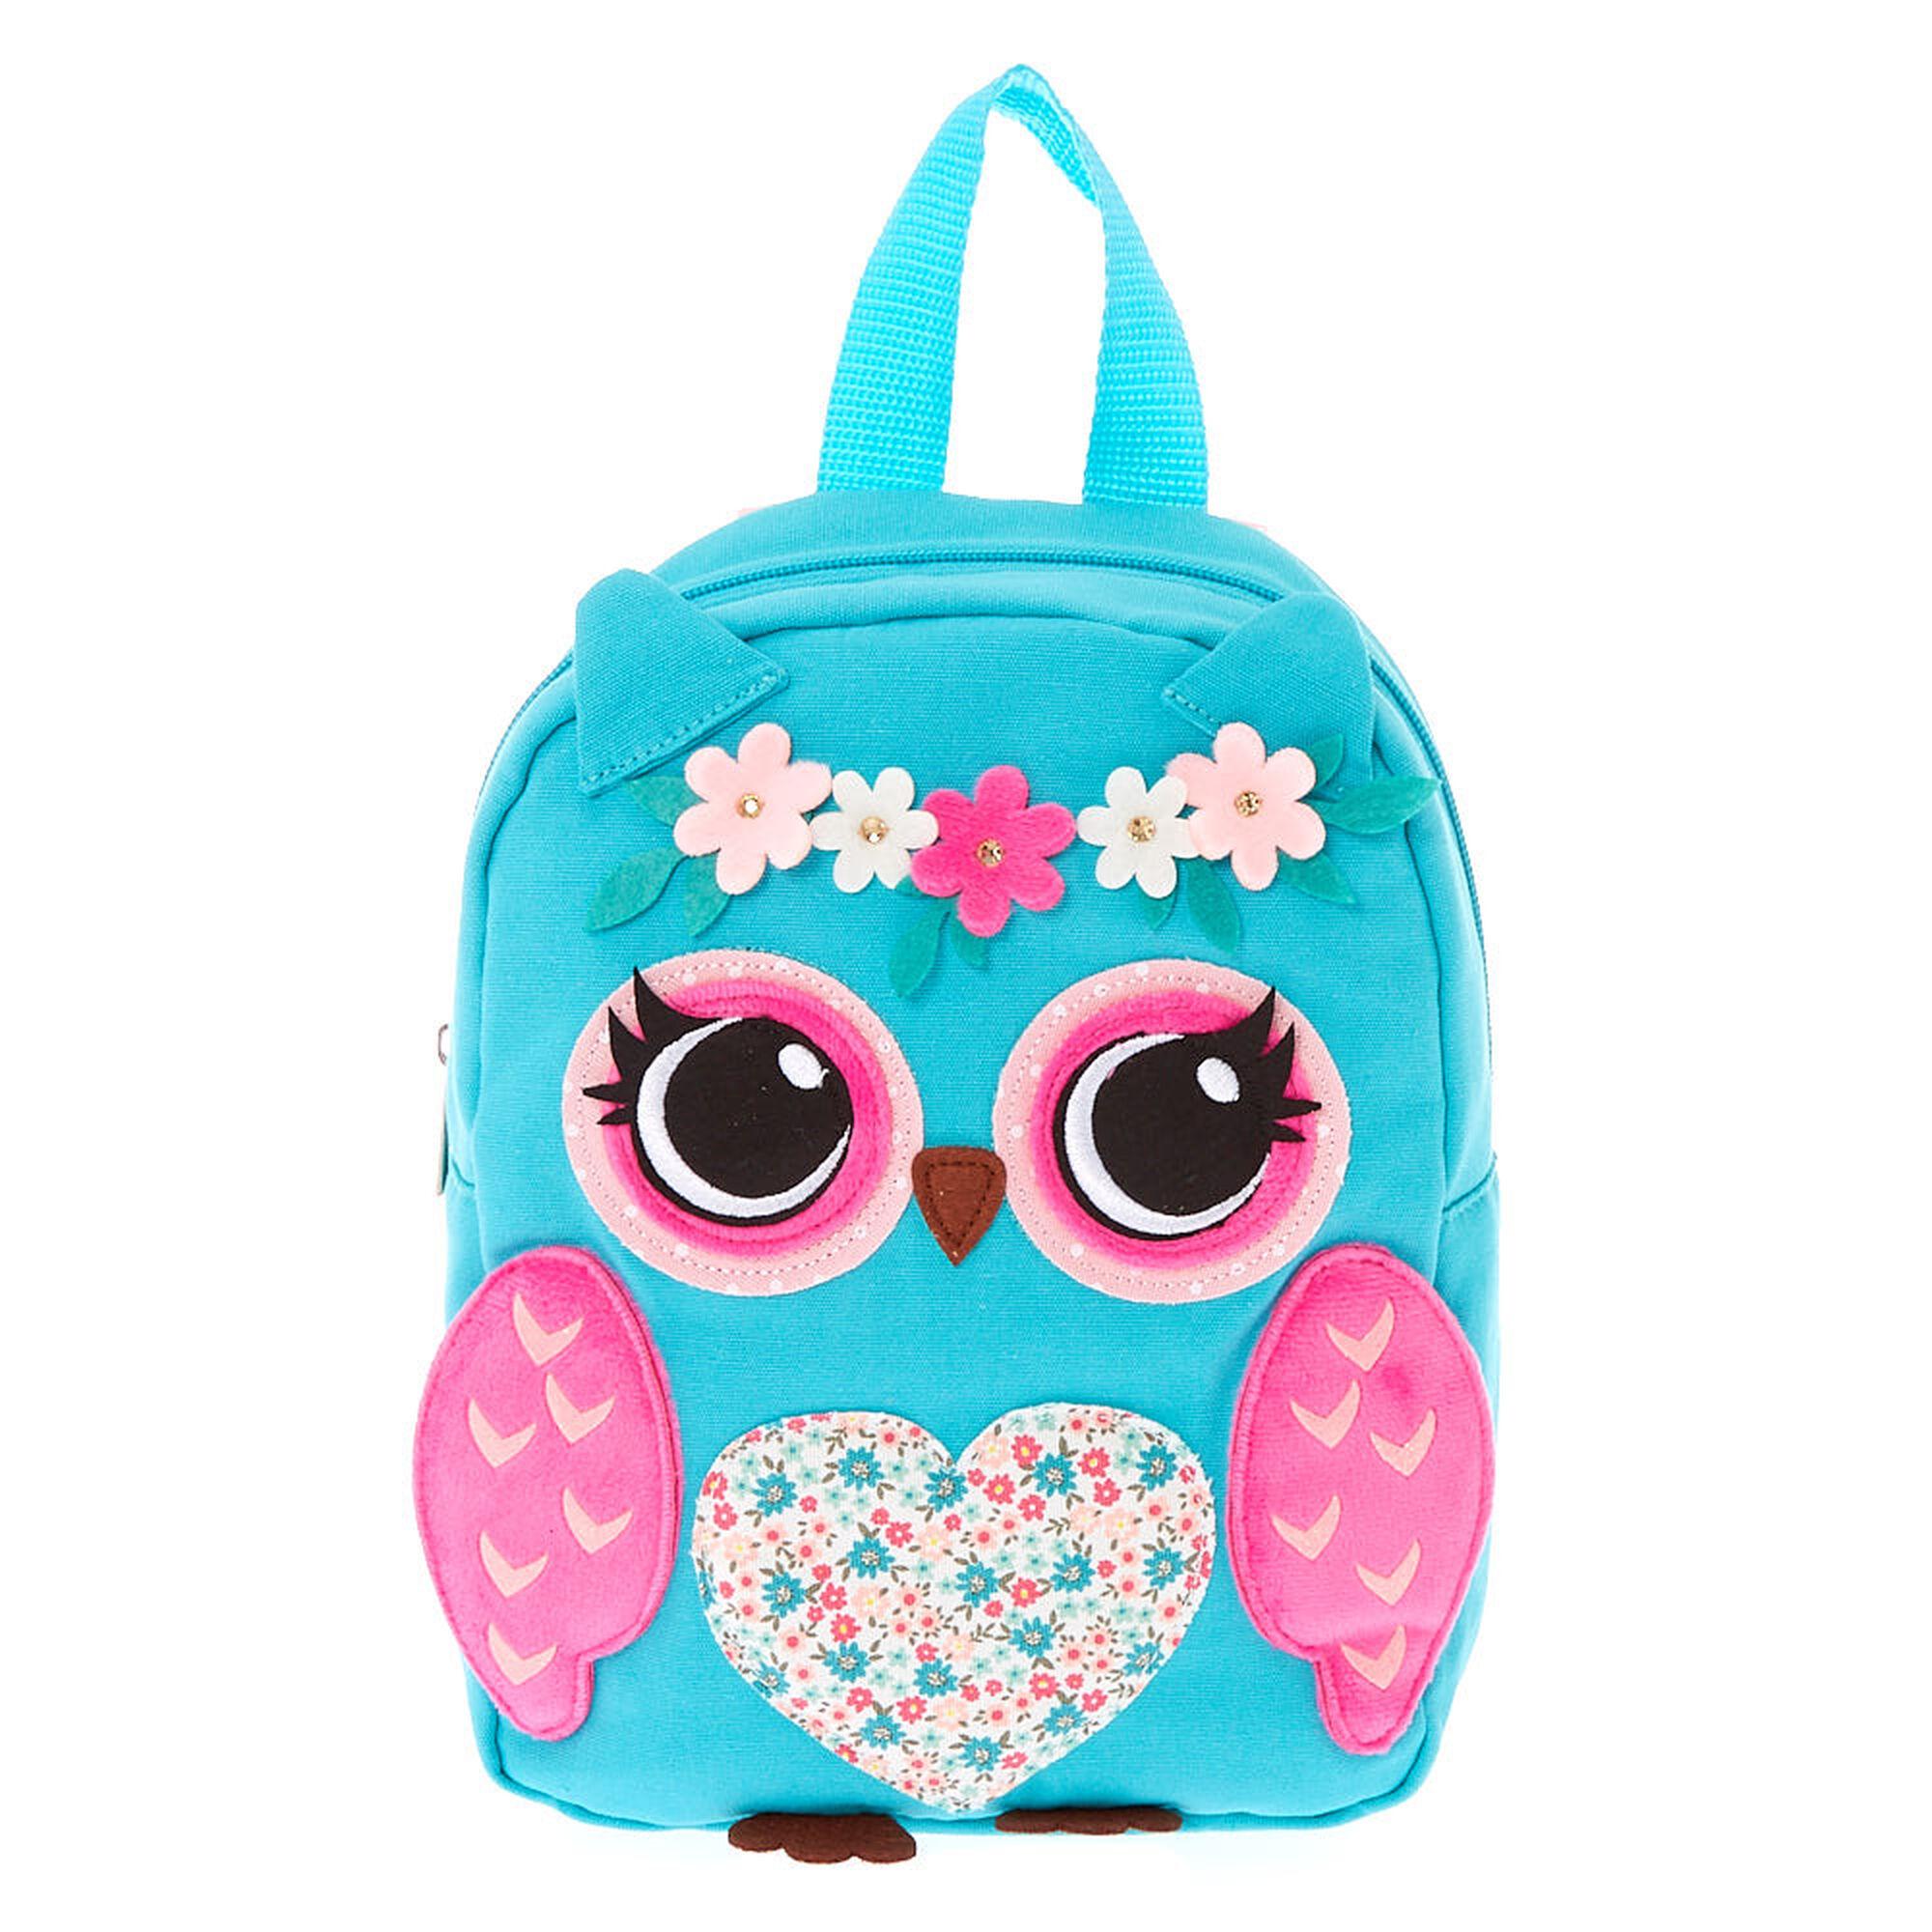 Claire/'s Club Patchwork Owl Drawstring Backpack Polka Dot Flowers Bag Bookbag